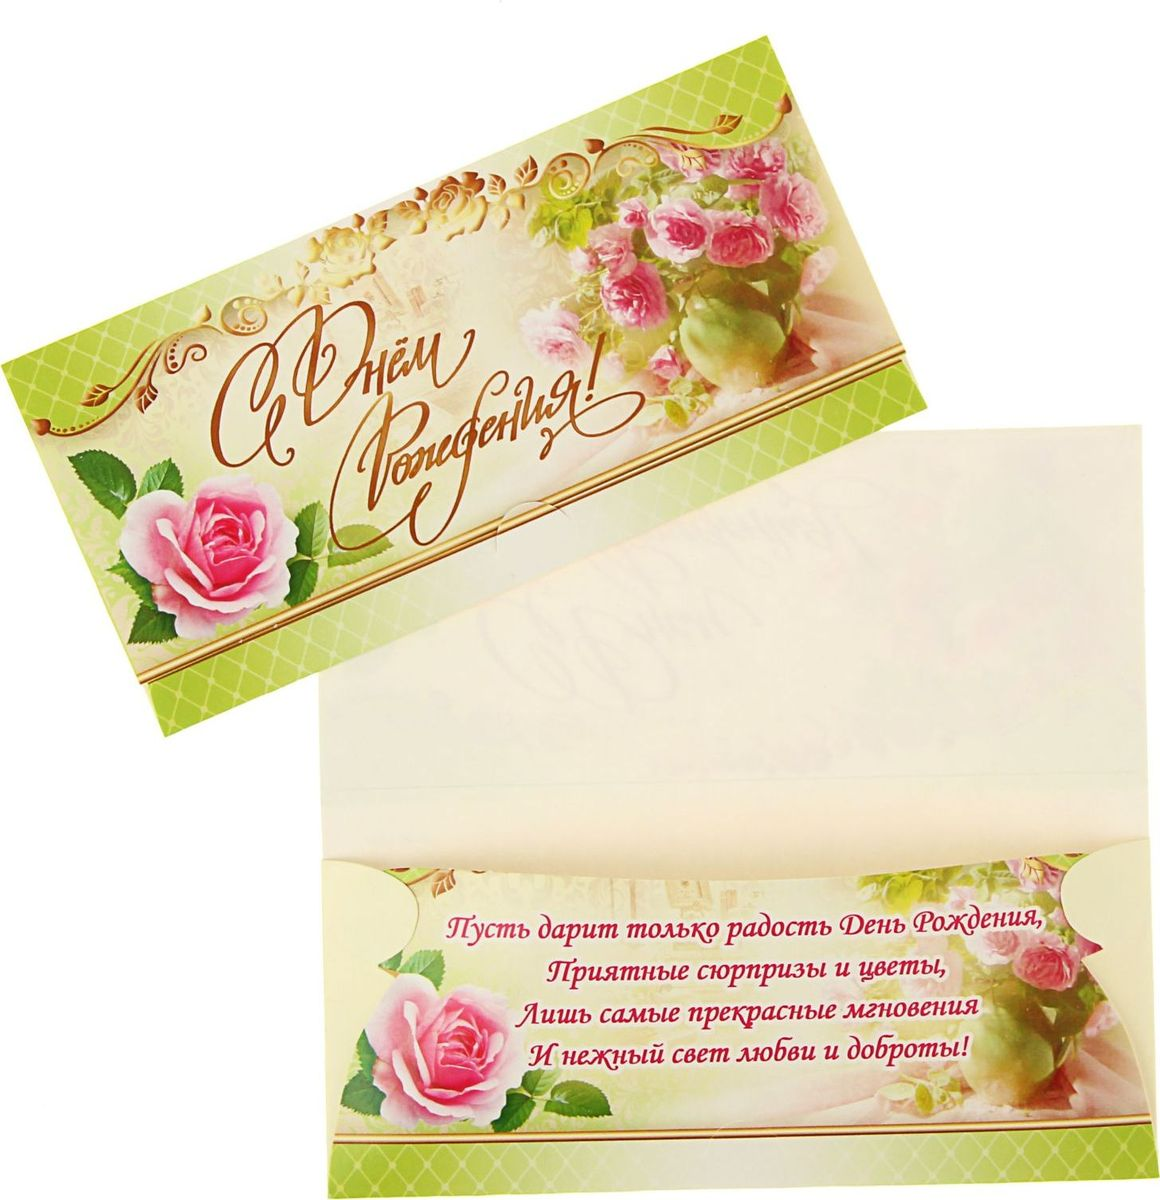 Место, открытка конверт на день рождения от коллектива